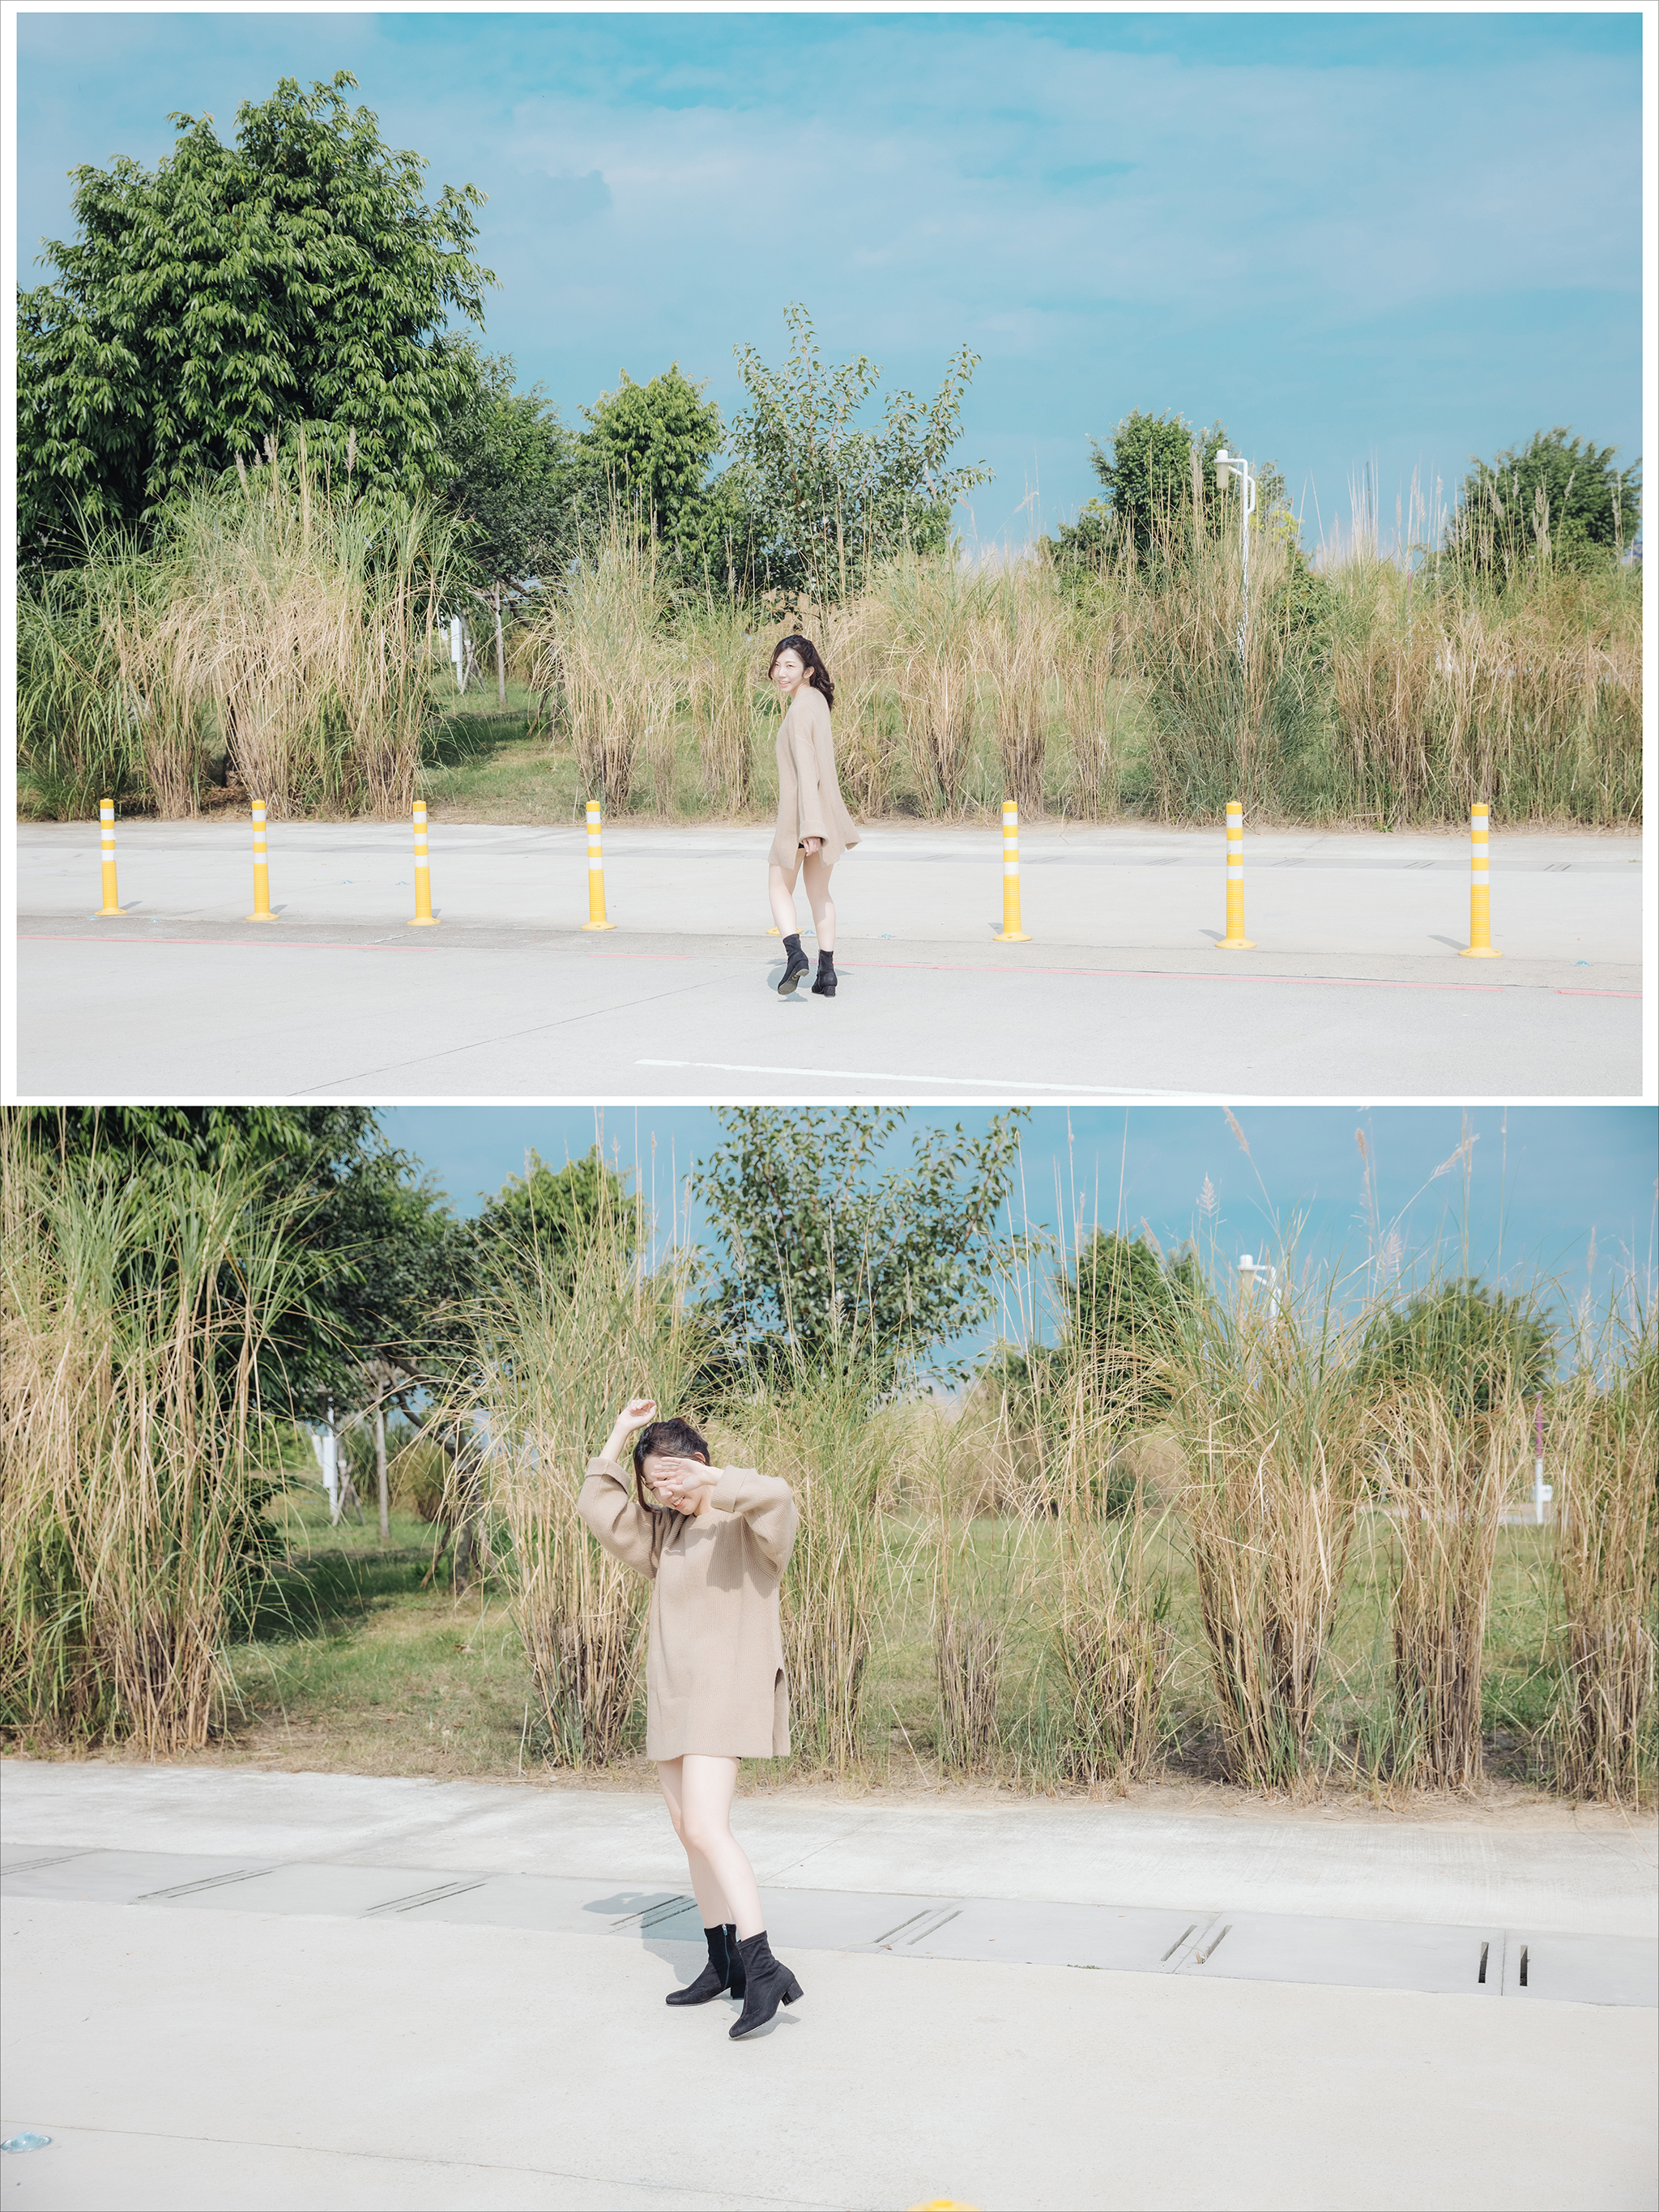 50635732017 521fdc7fb3 o - 【秋季寫真】+Shan+